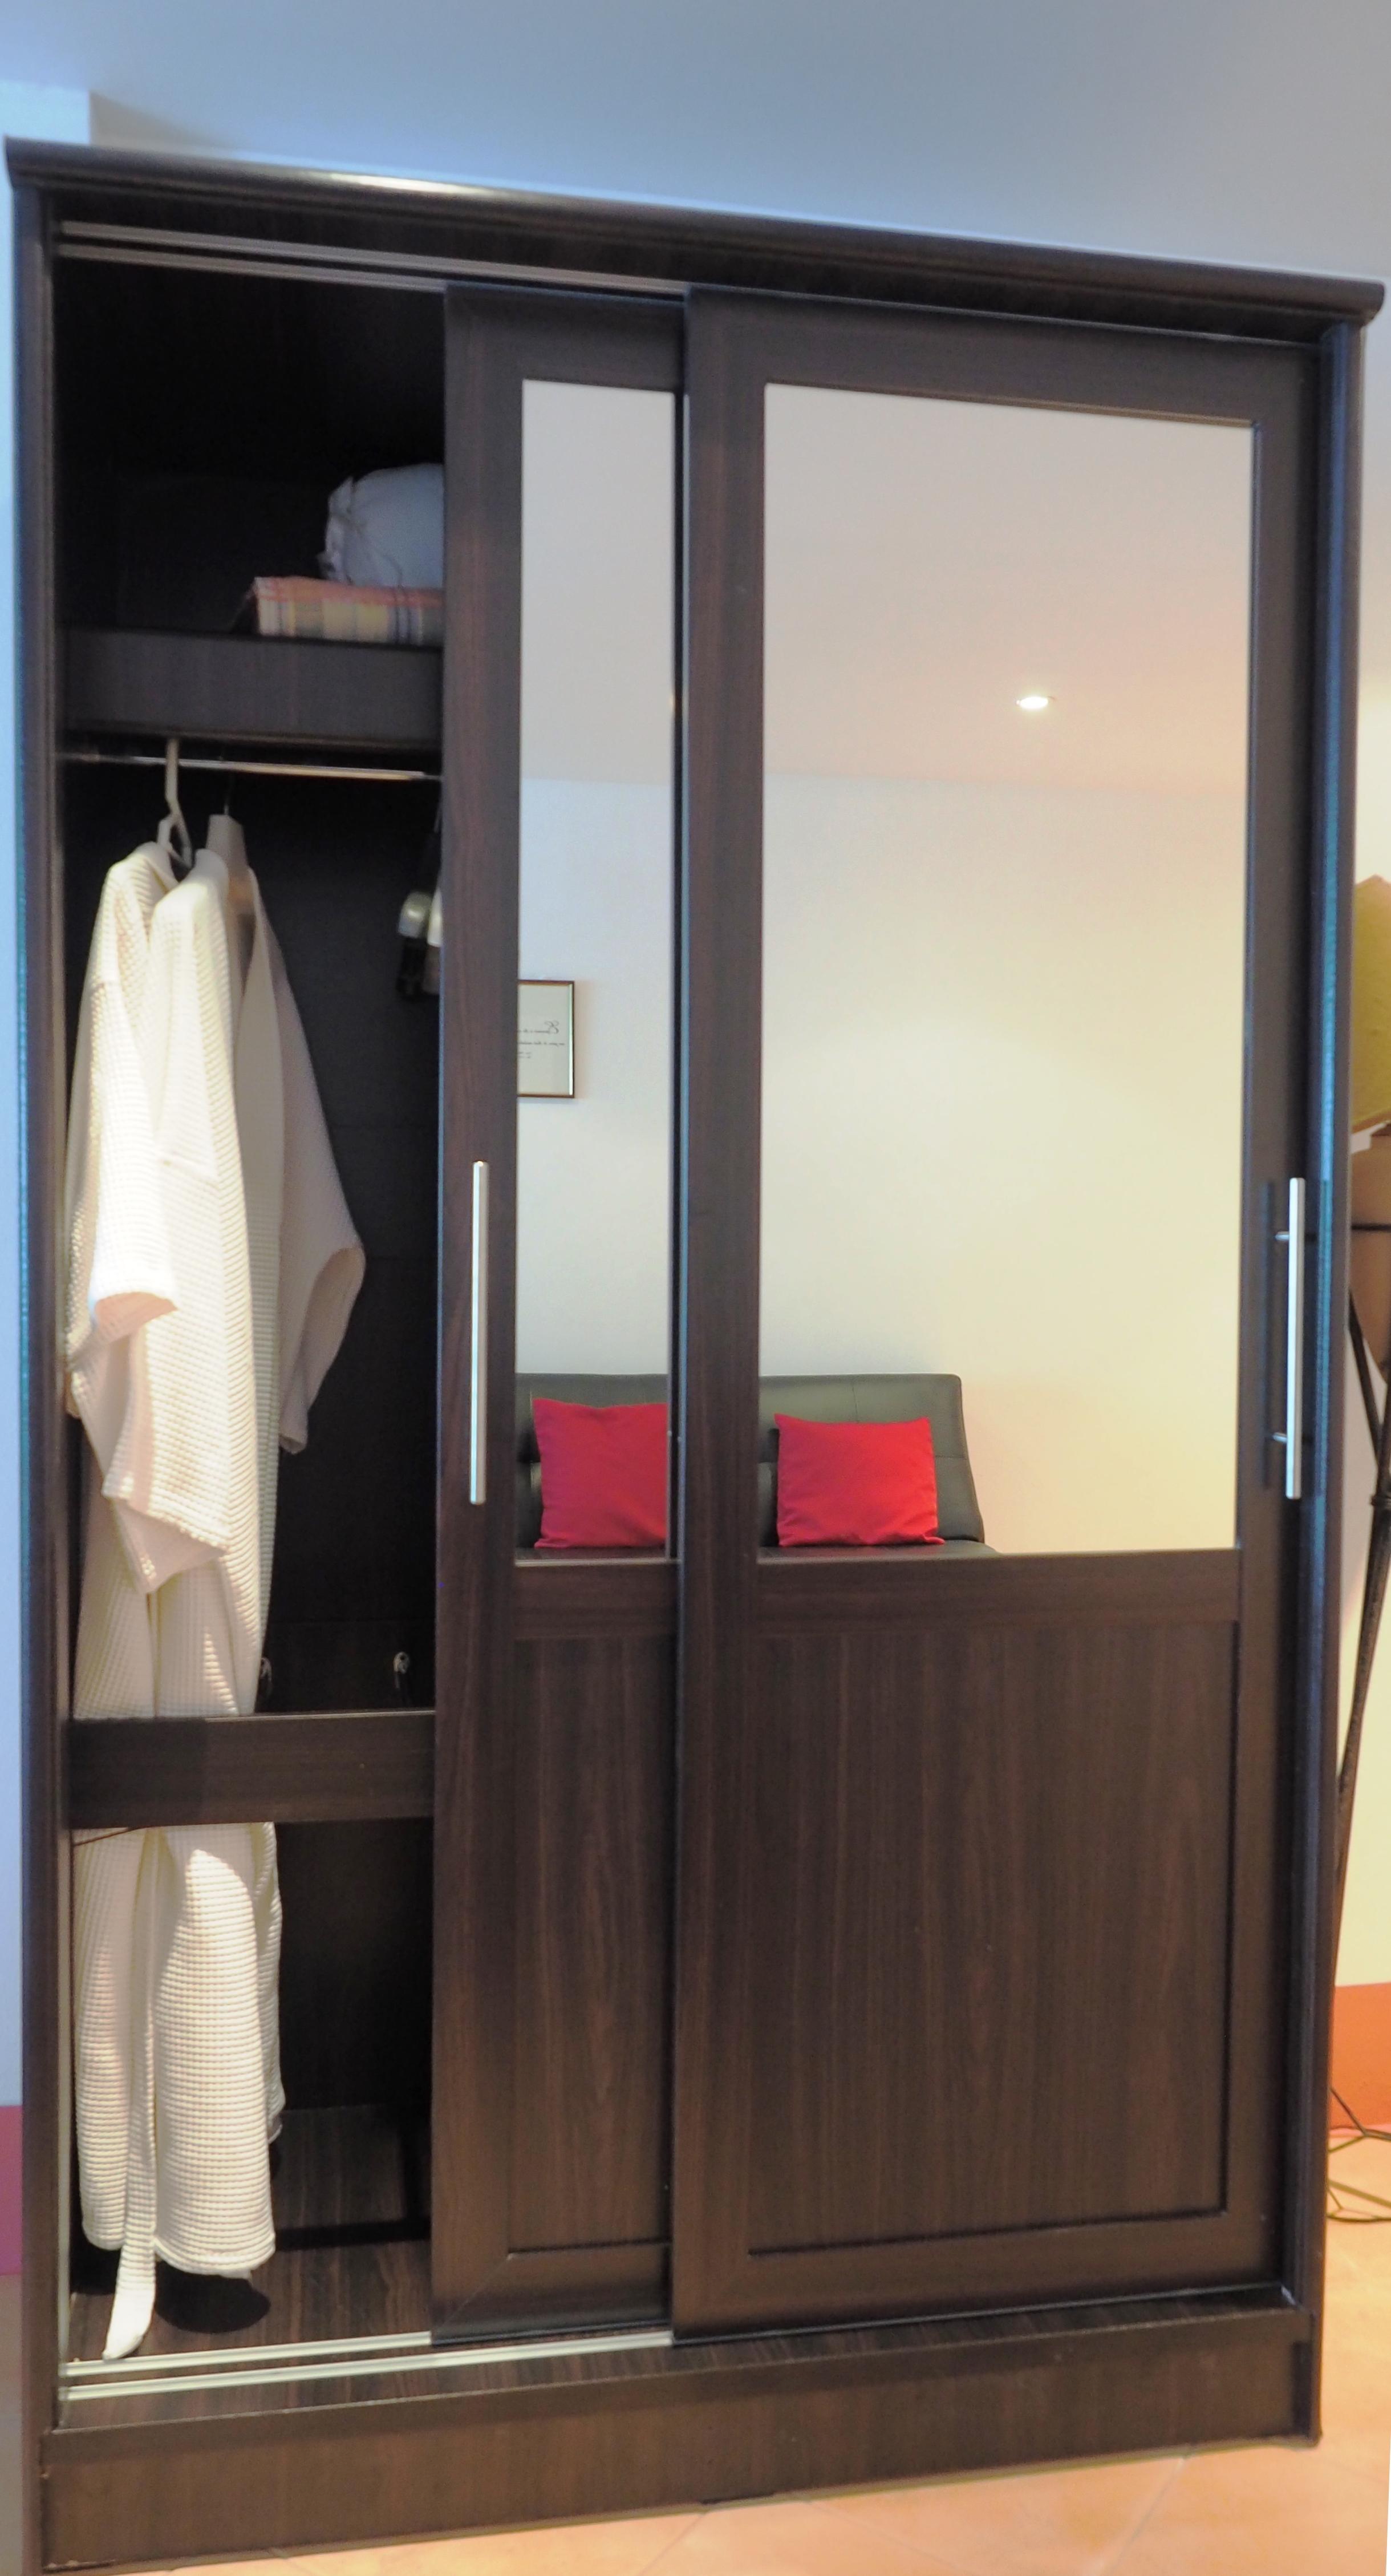 Aquarius Guesthouse - Room 302 Jacuzzi Suite